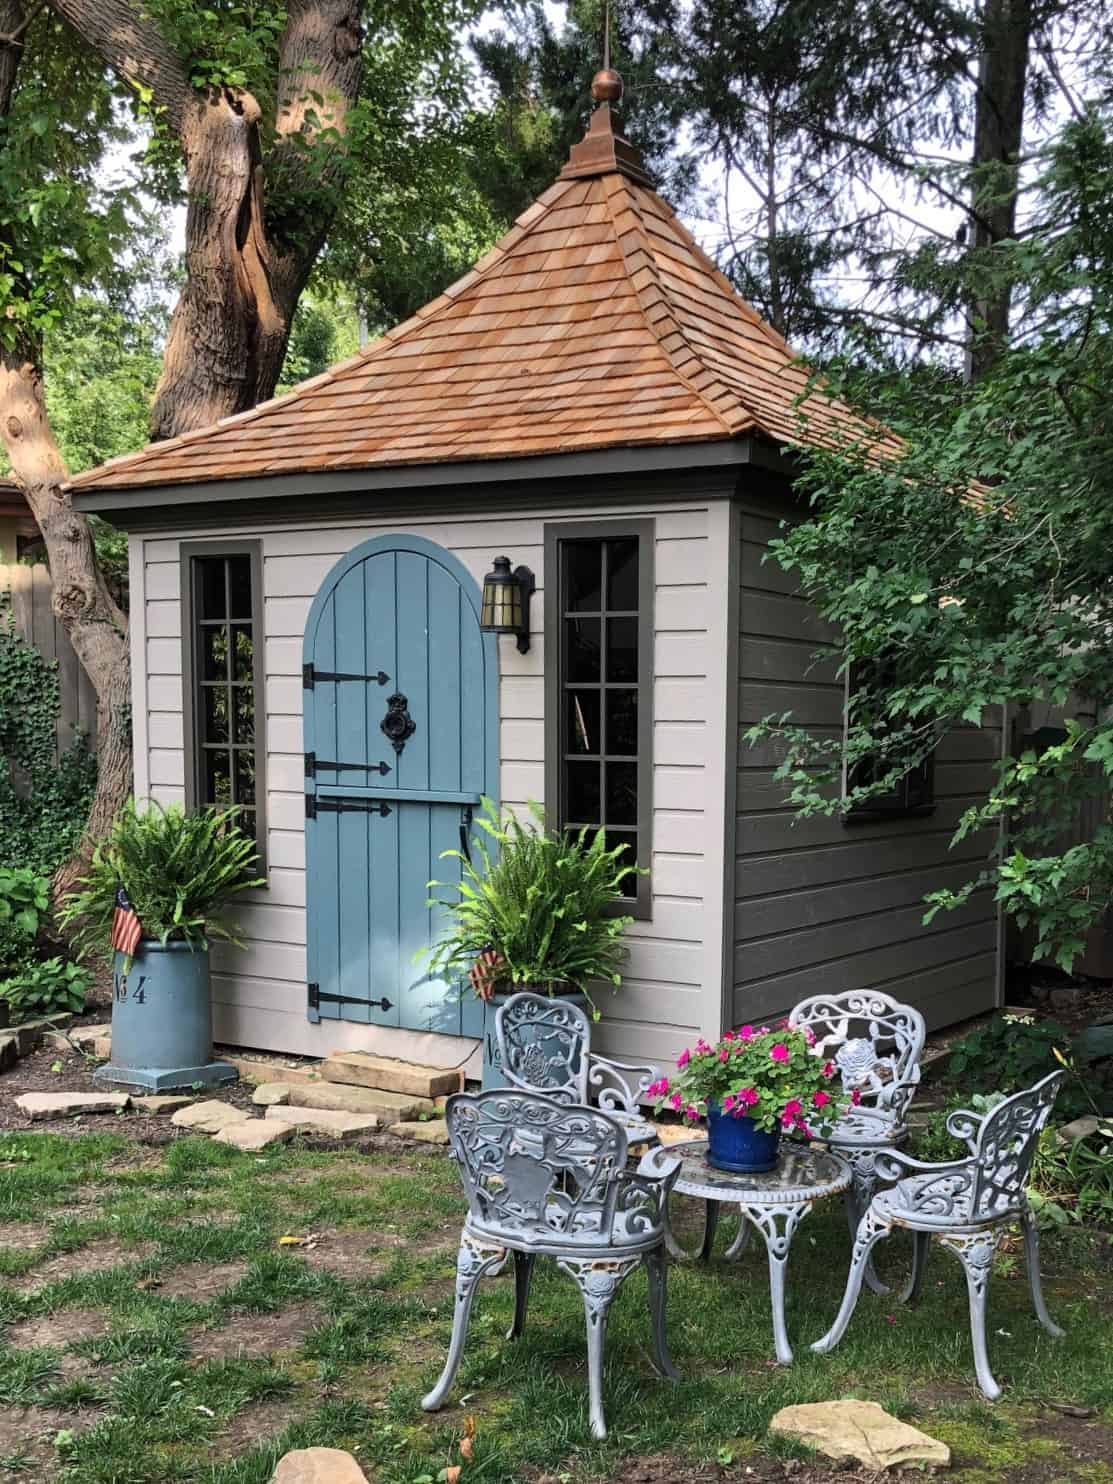 Backyard Shed - Summerwood Products